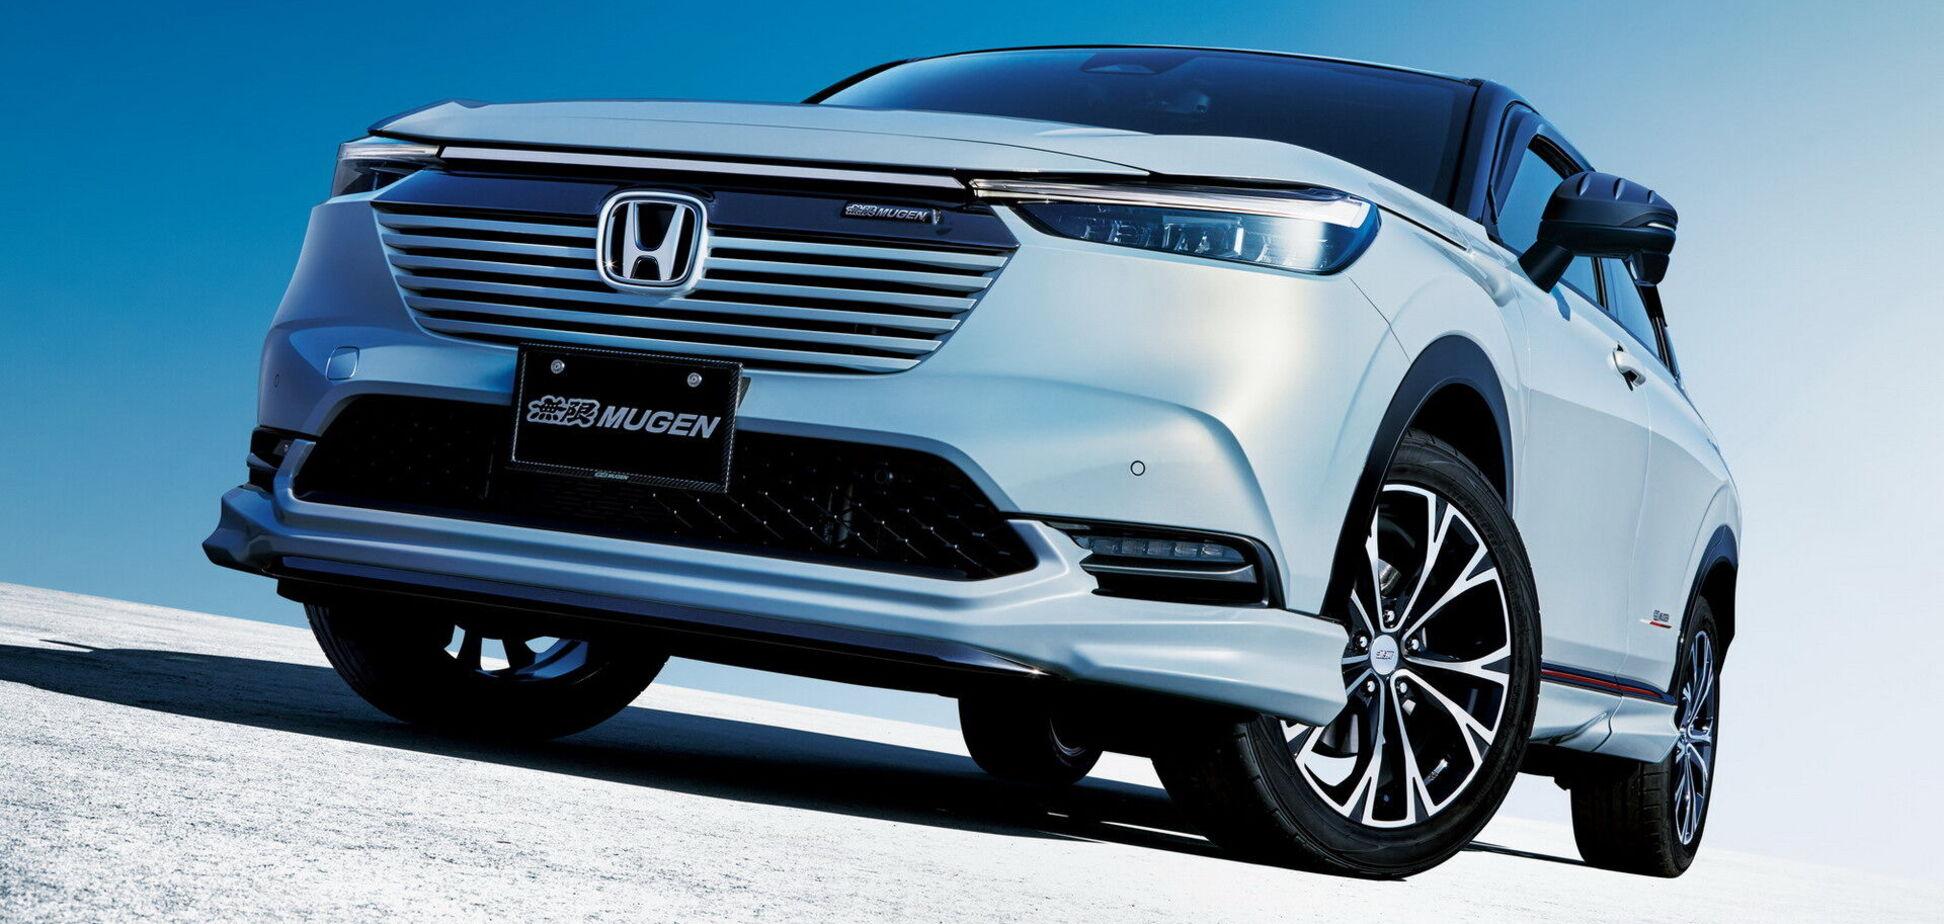 Mugen запропонував пакет тюнінгу для Honda HR-V